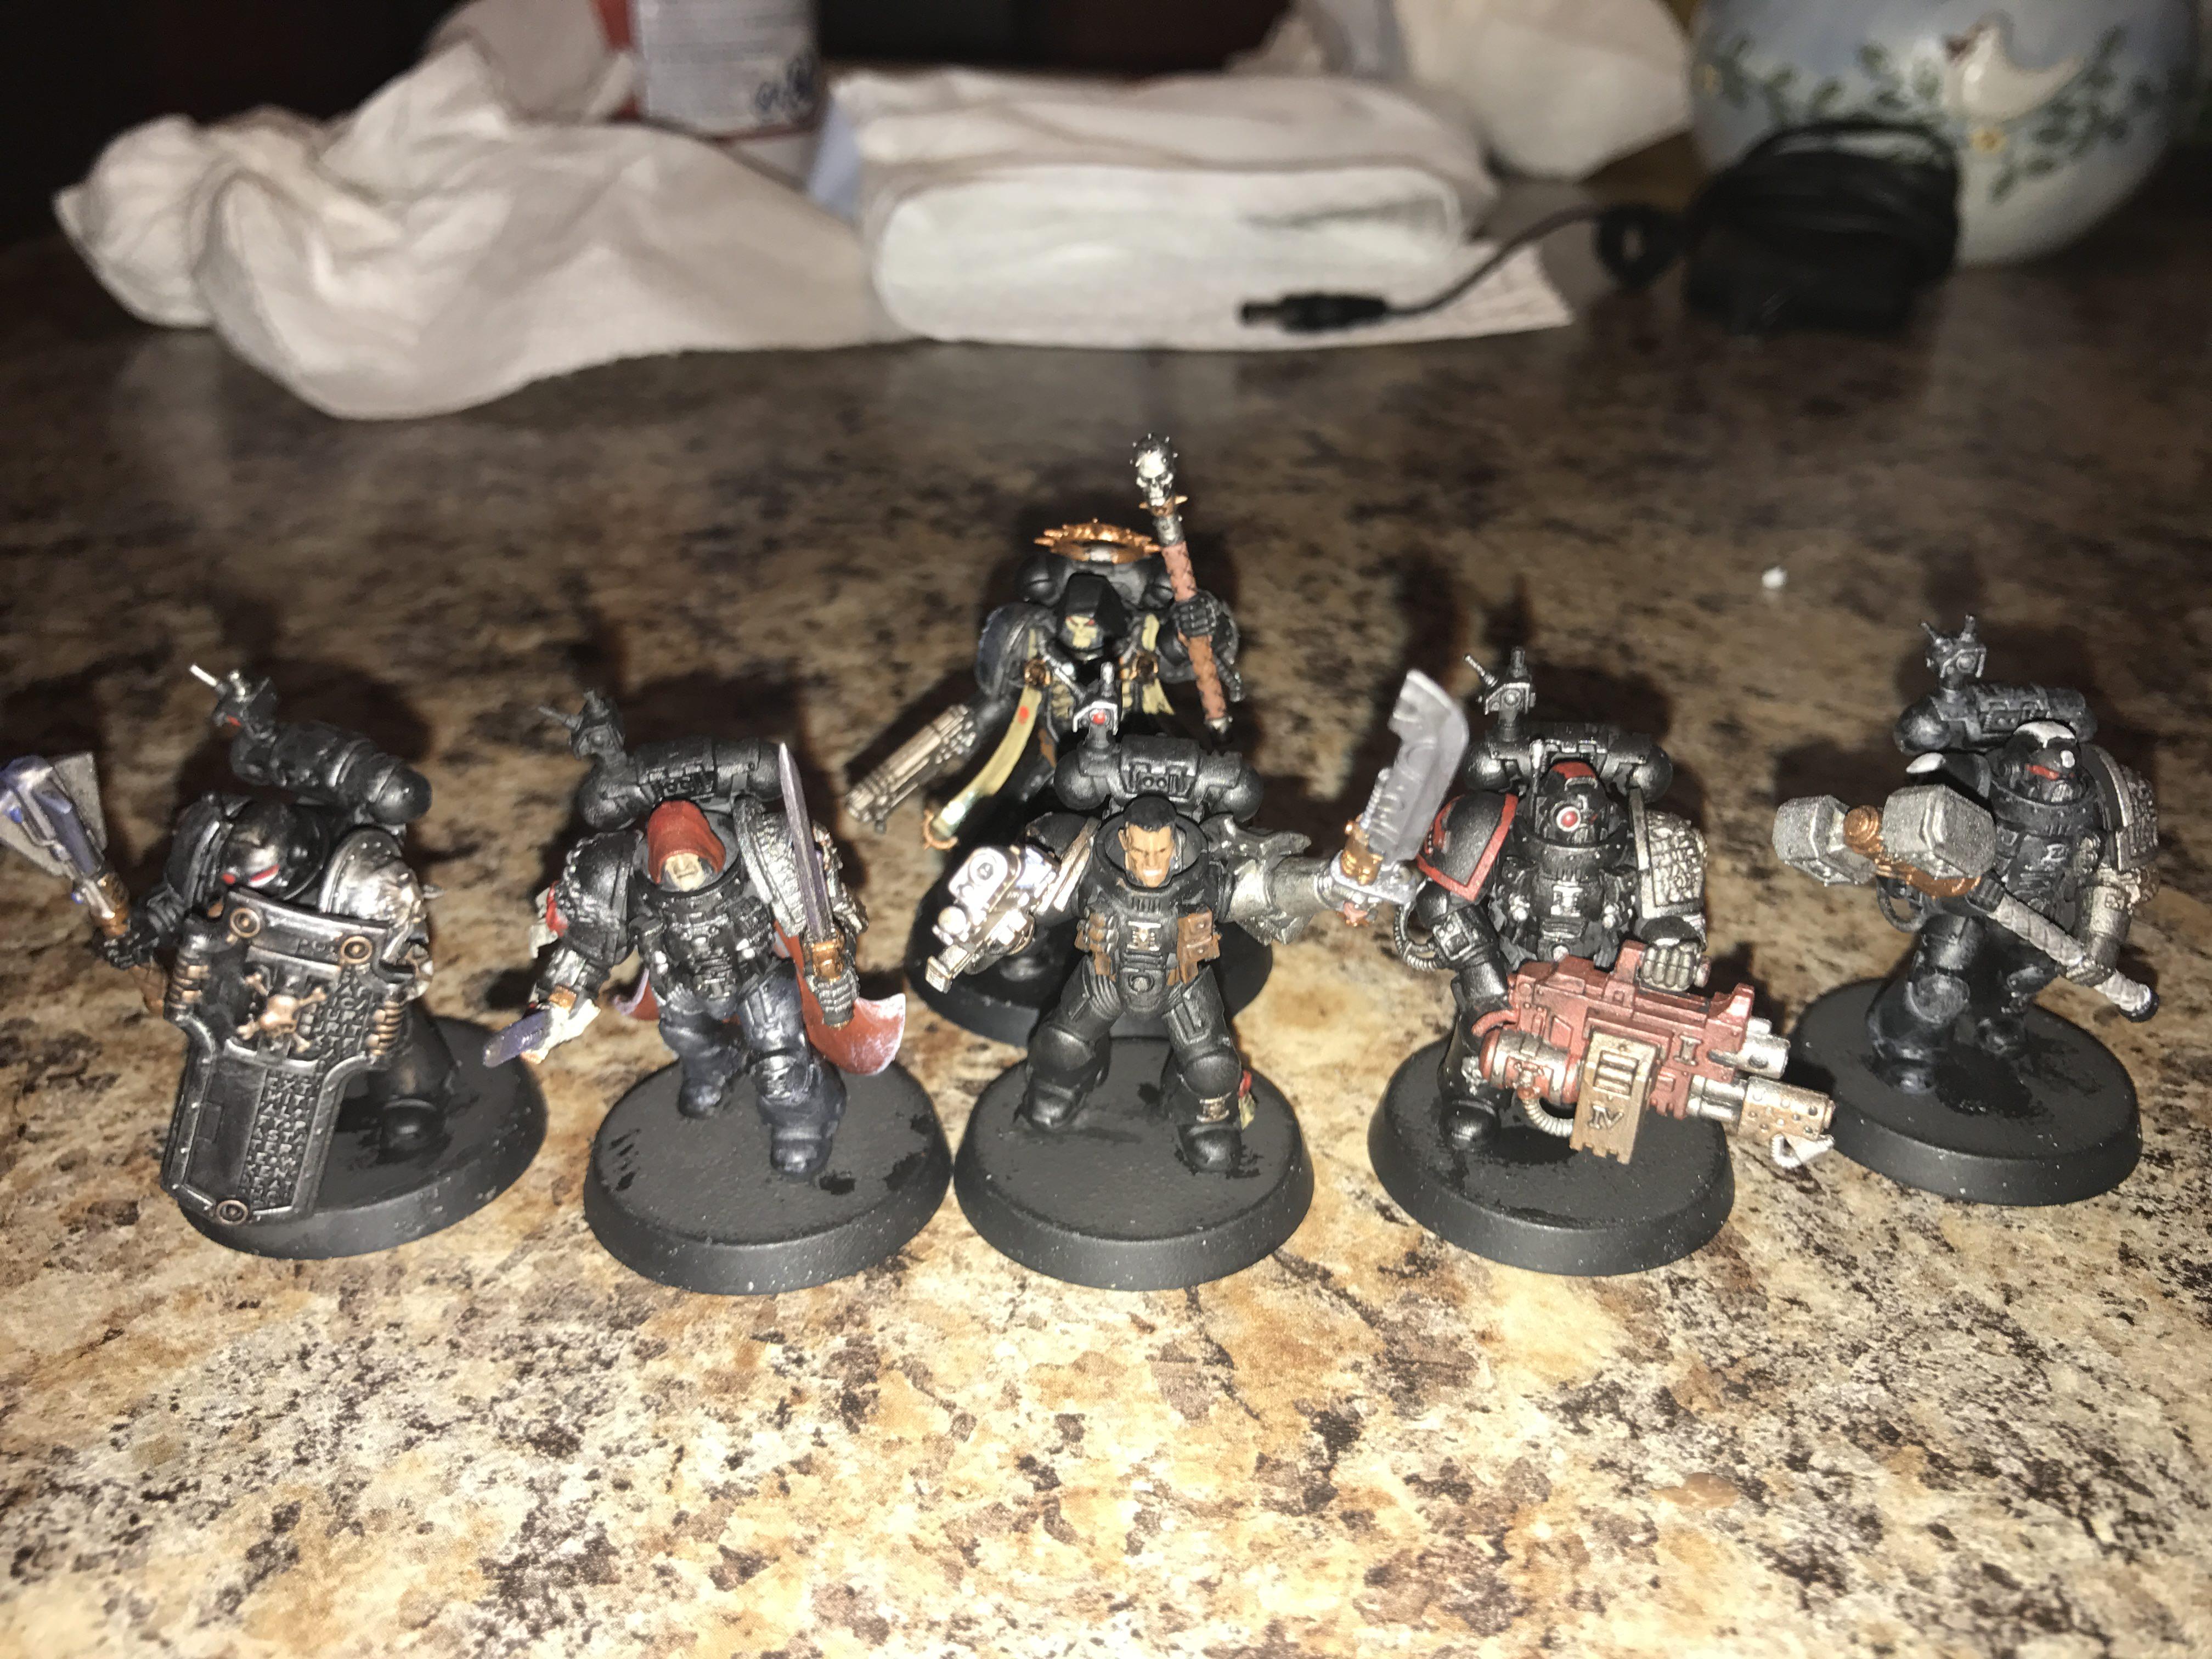 First Deathwatch Kill Team painted bonus chaplain in background 4032x3024